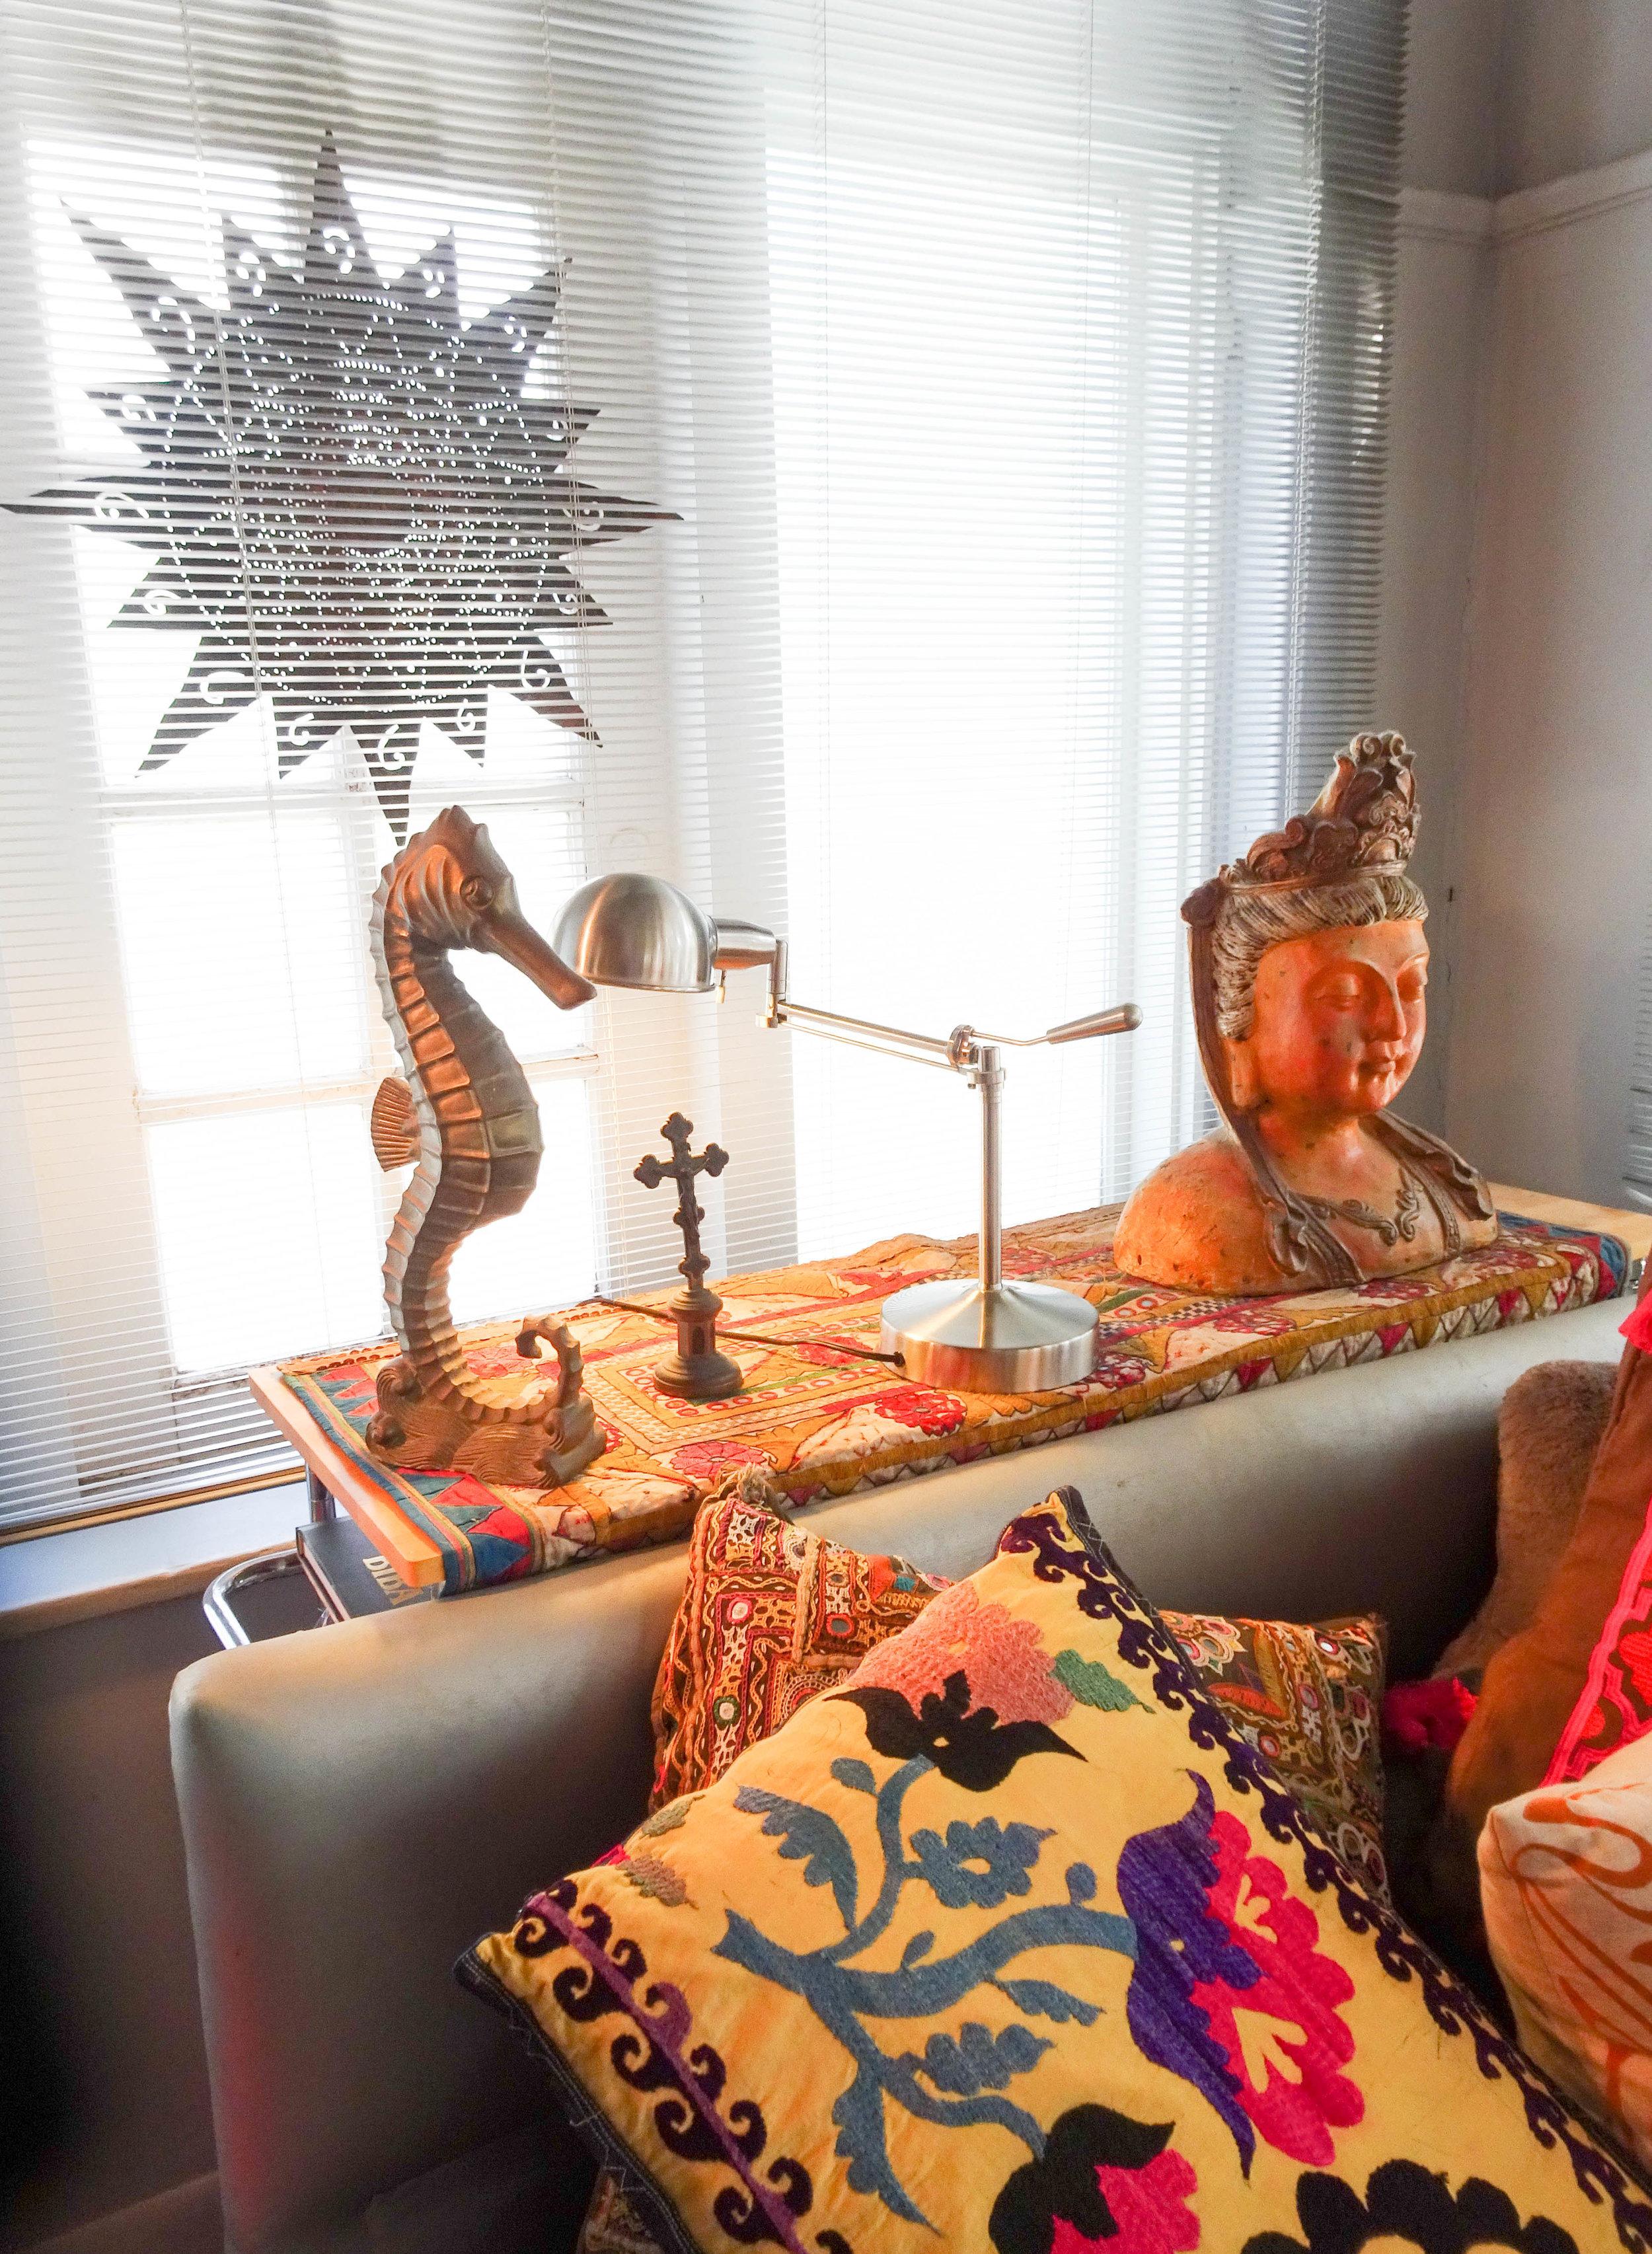 {HOME TOUR} FASHION DESIGNER BARBARA HULANICKI SHOWS US AROUND HER MIAMI APARTMENT